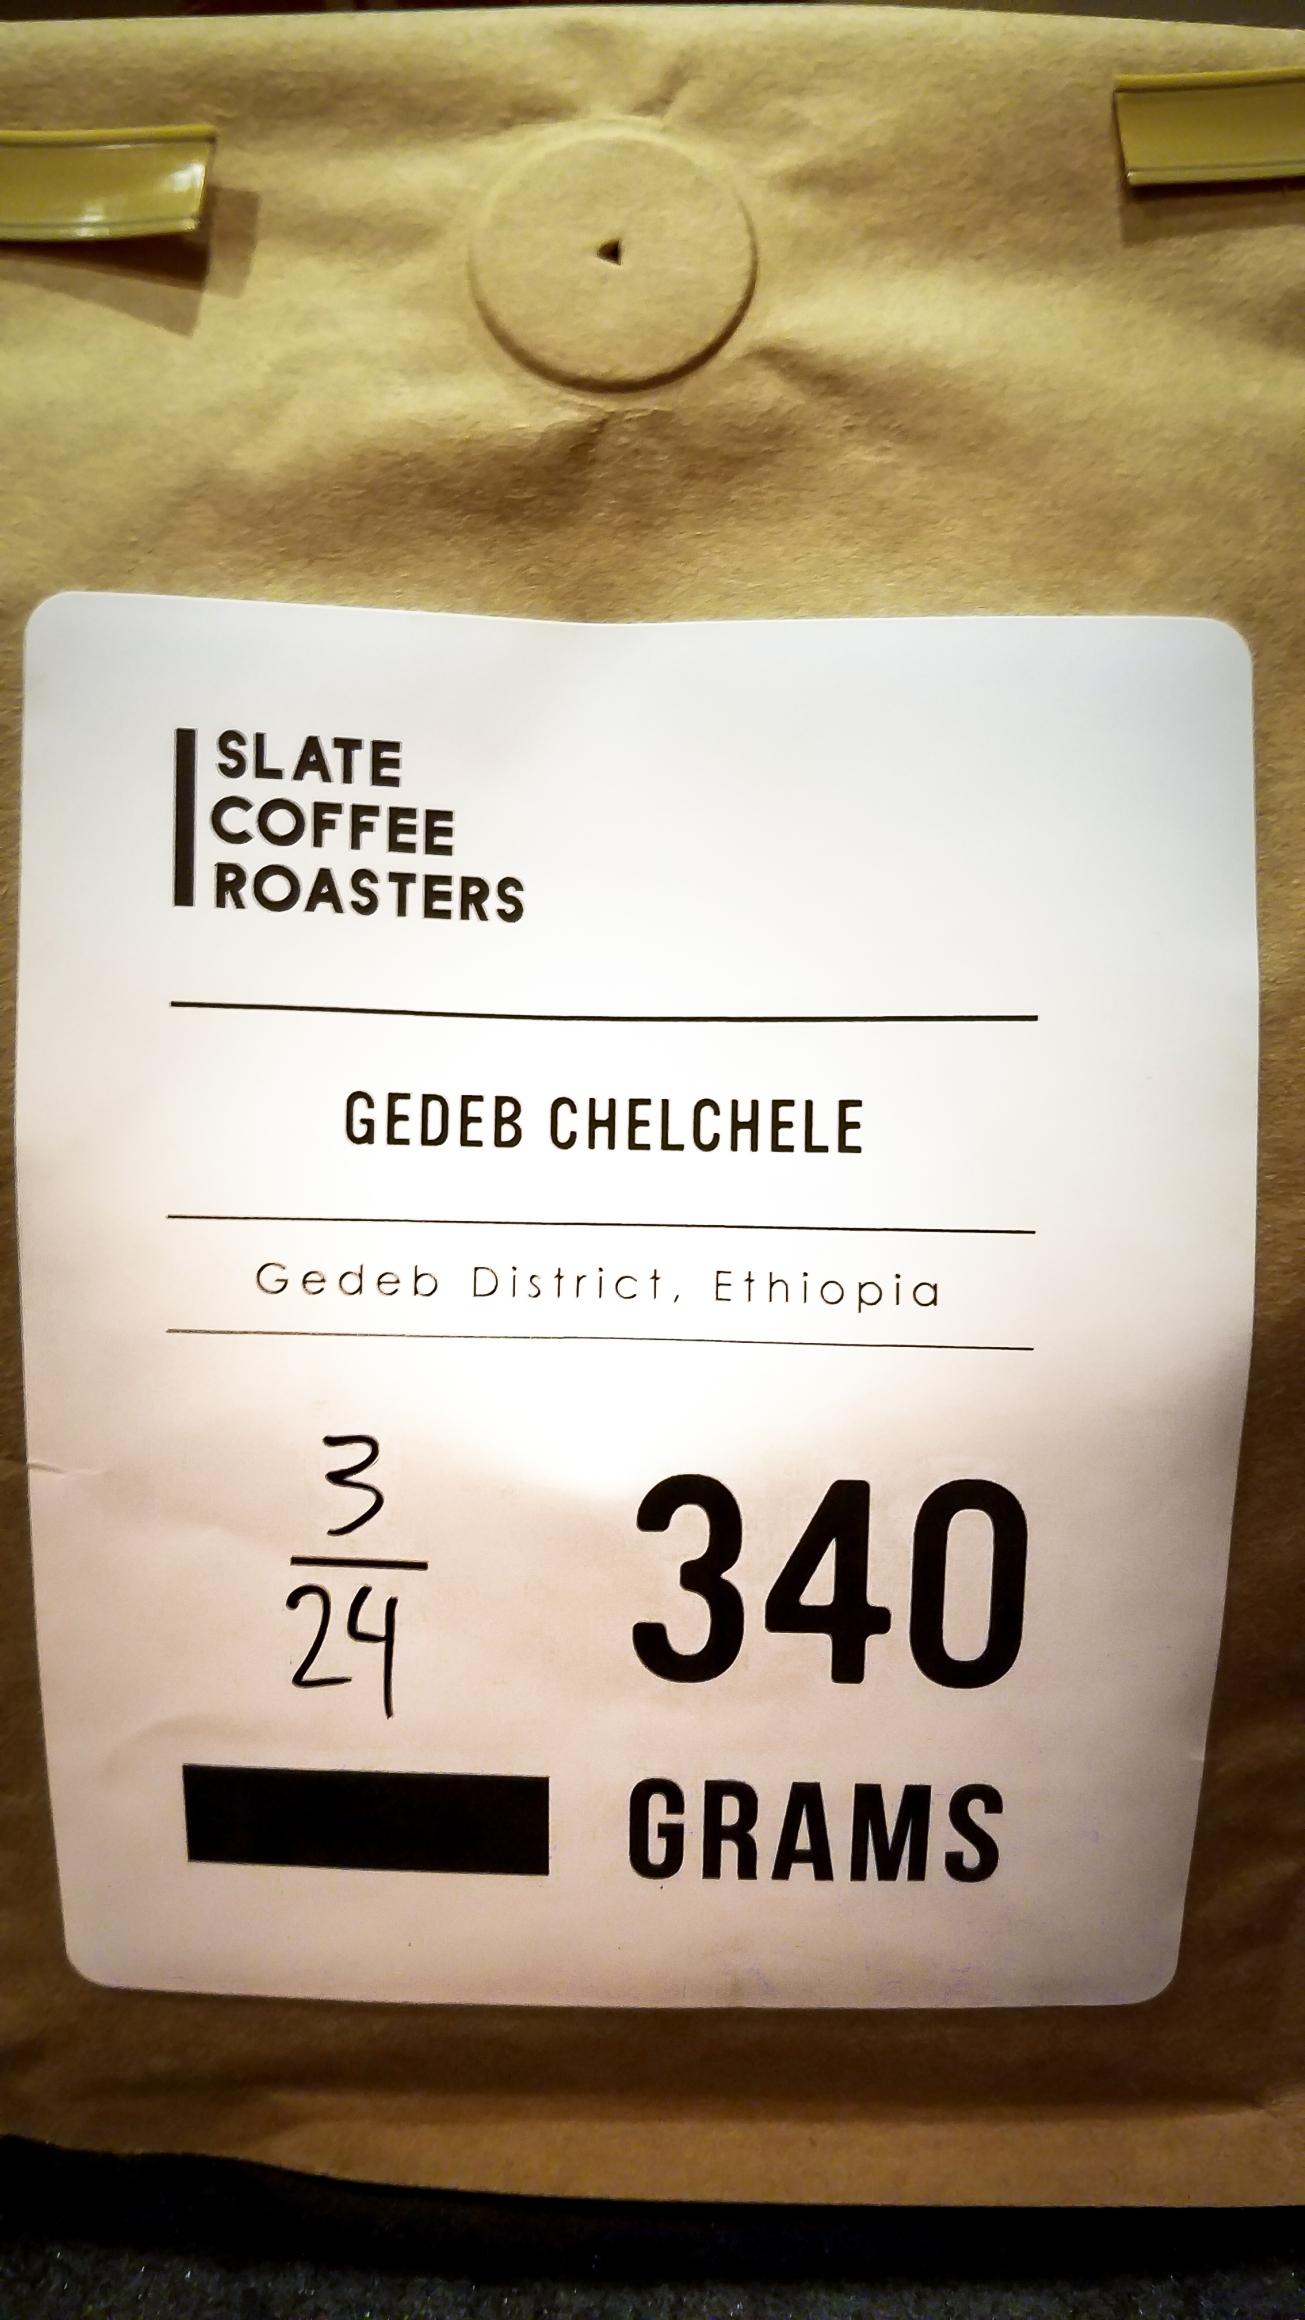 Slate Coffee Roasters Gedeb Chelchele